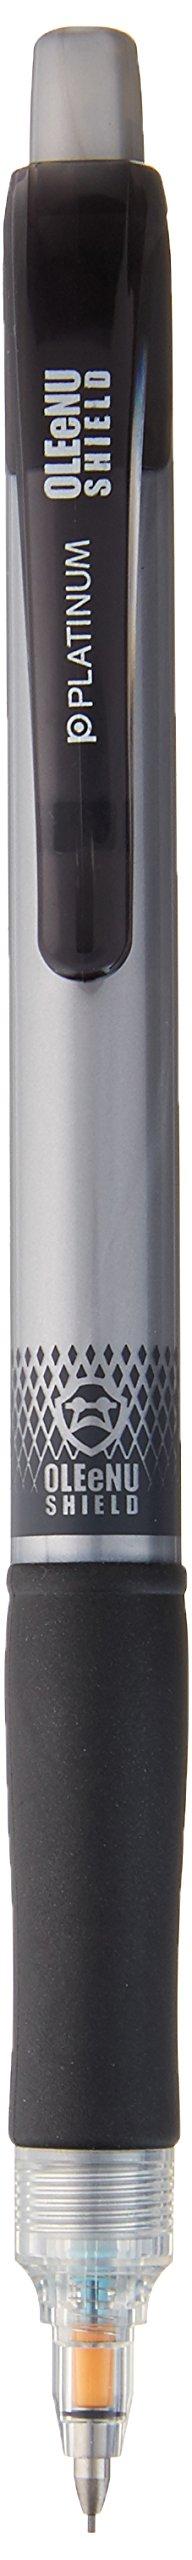 Platinum lápiz mecánico oleenu Shield, color plata